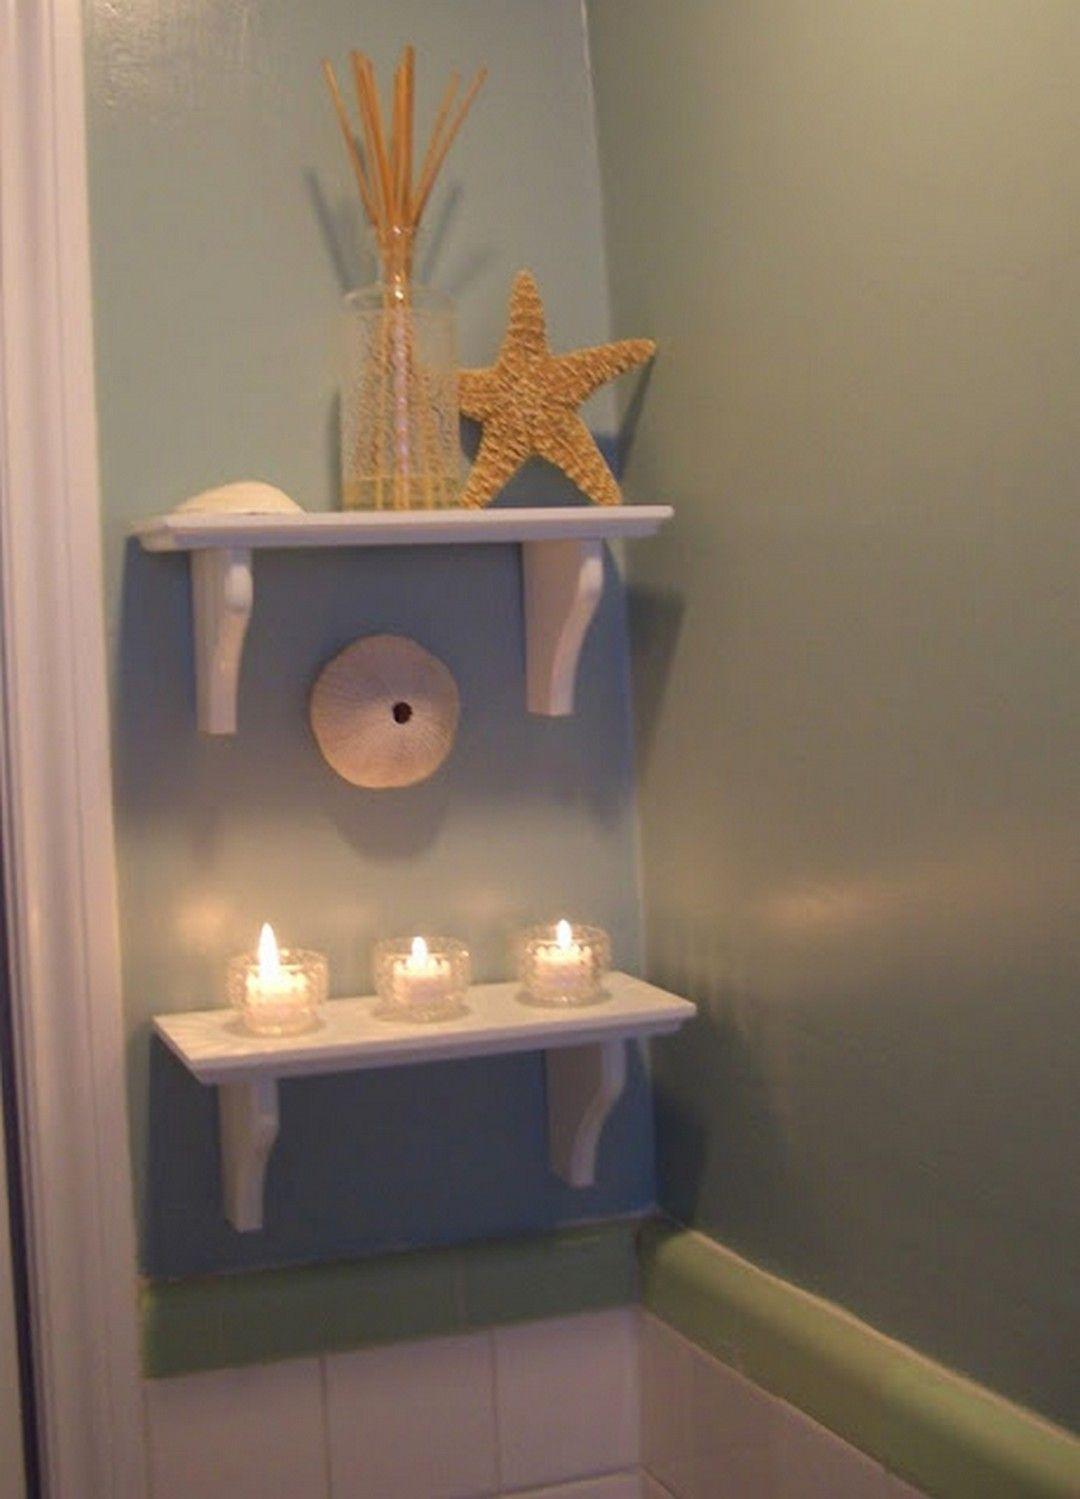 110 adorable shabby chic bathroom decorating ideas - Beach theme decorating ideas ...